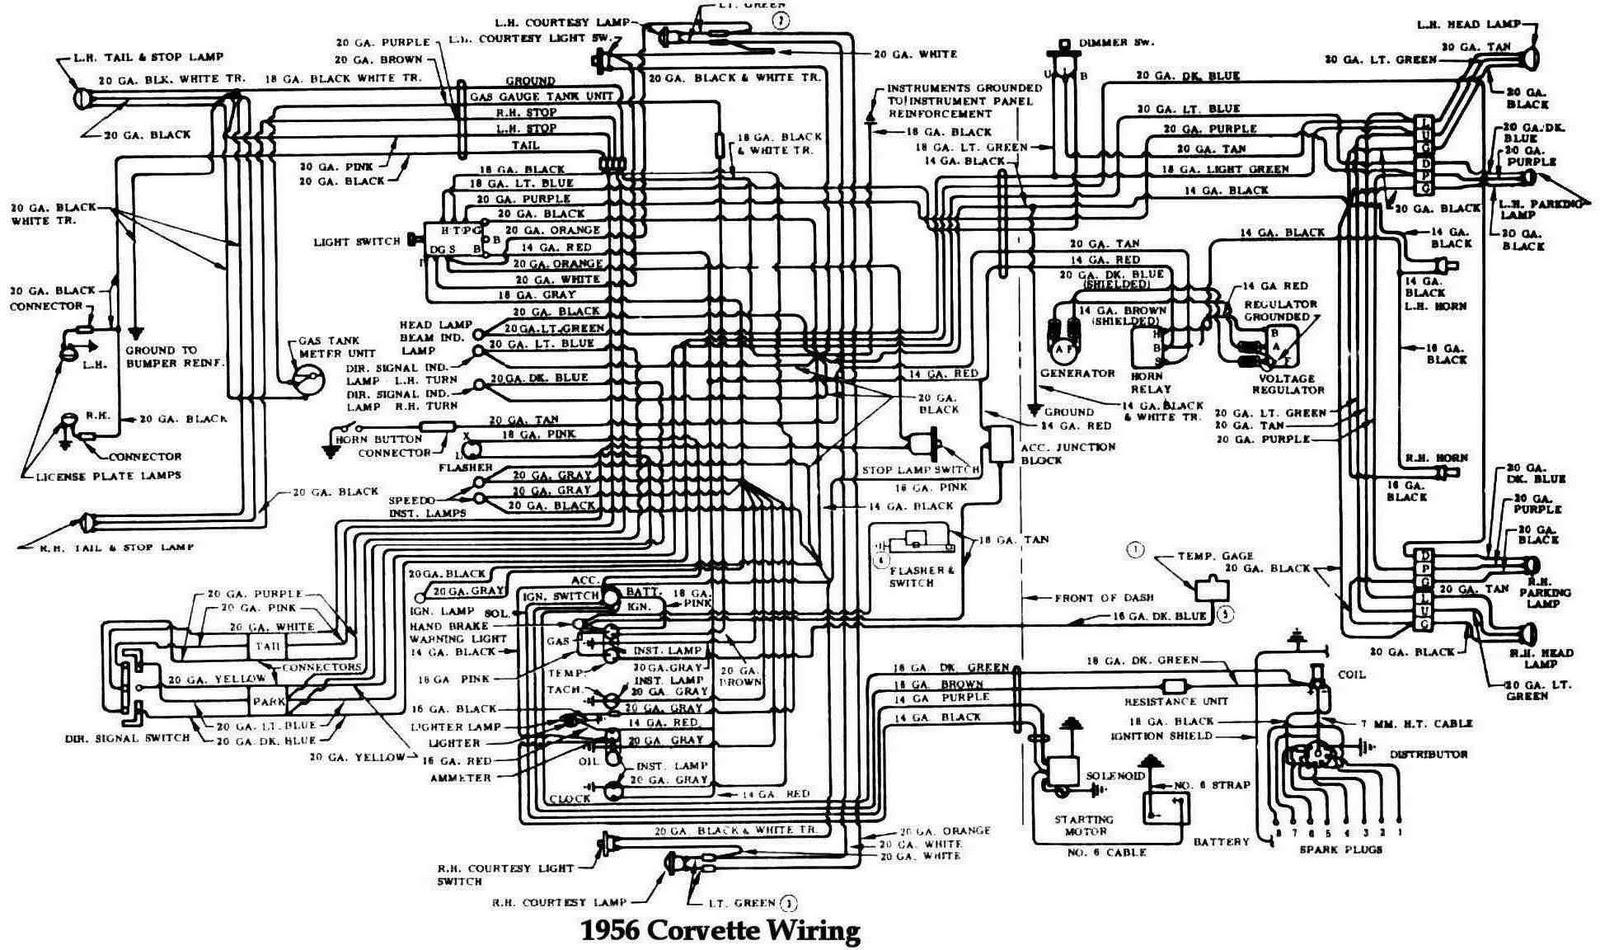 1979 Chevrolet Corvette Wiring Diagram - Wiring Diagram